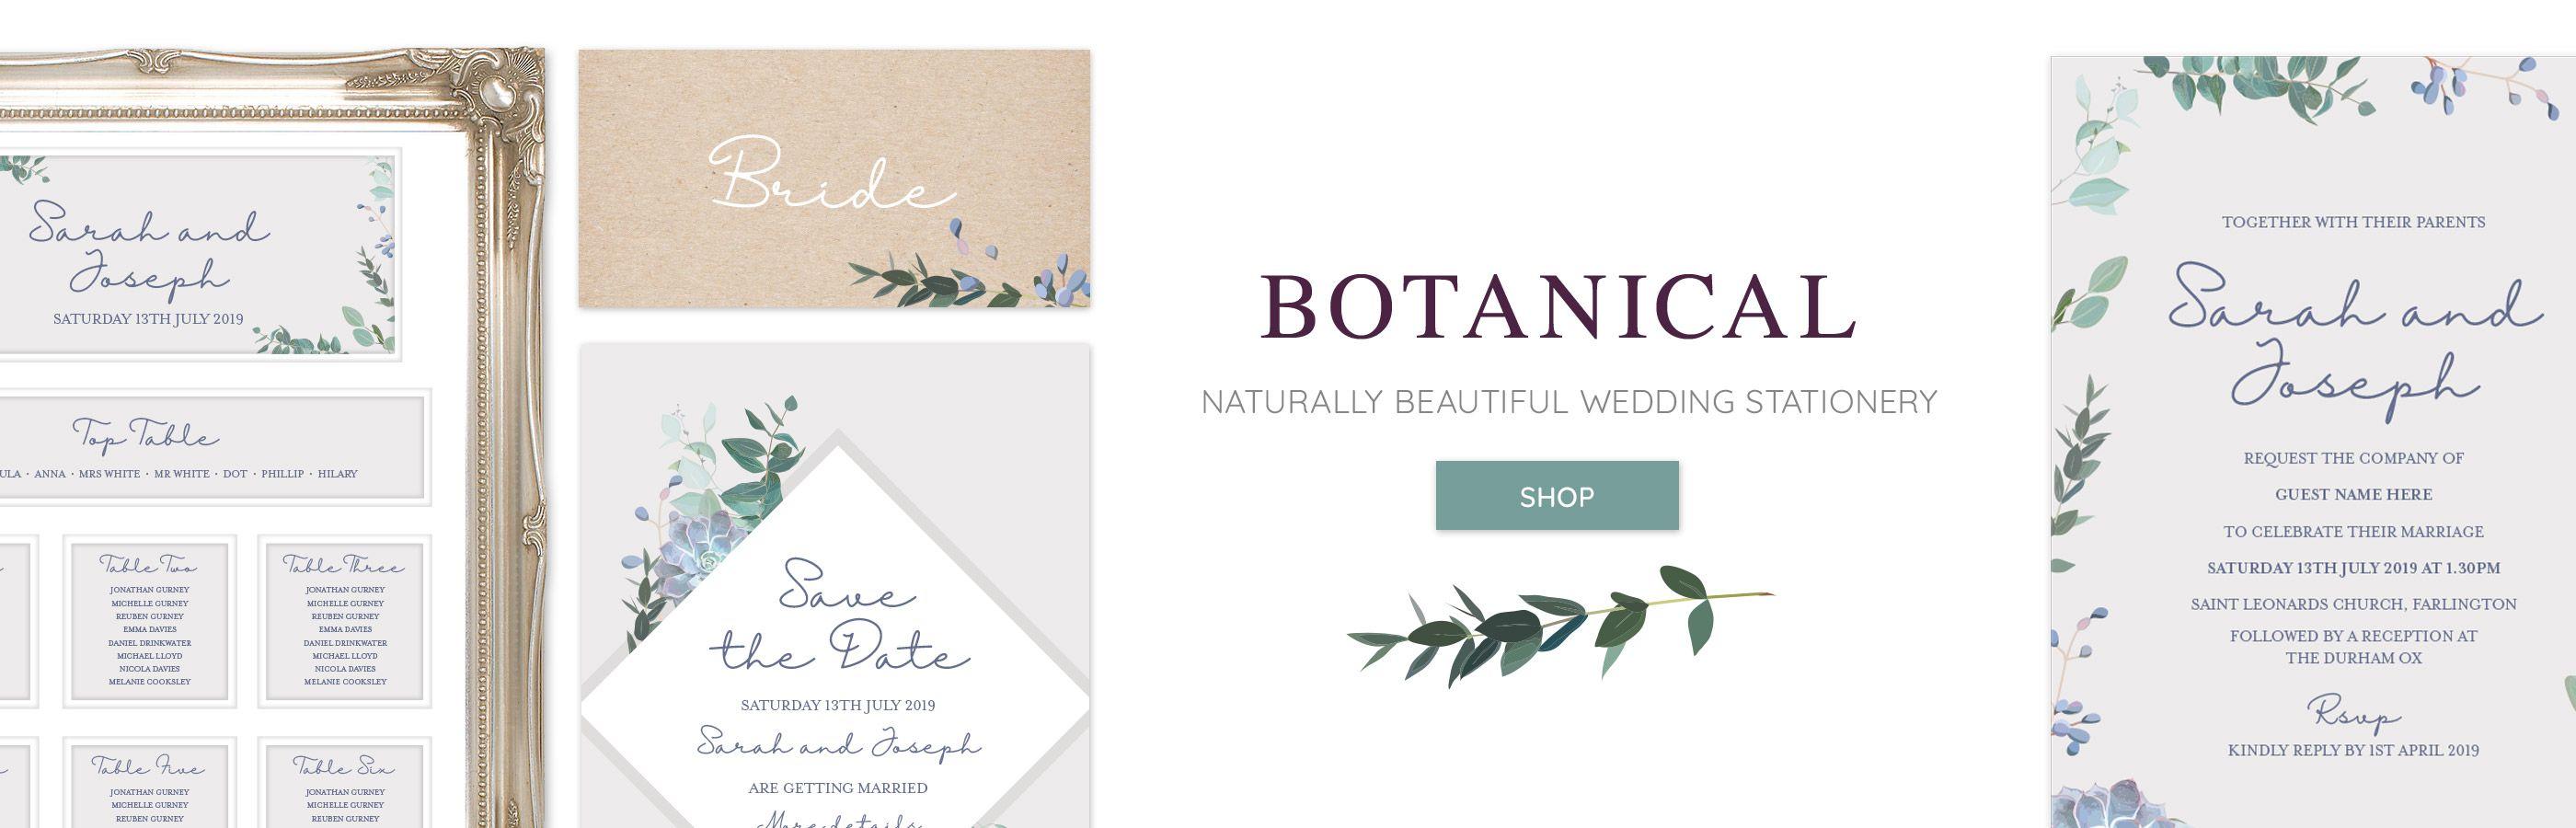 Botanical Wedding Stationery Love Invited